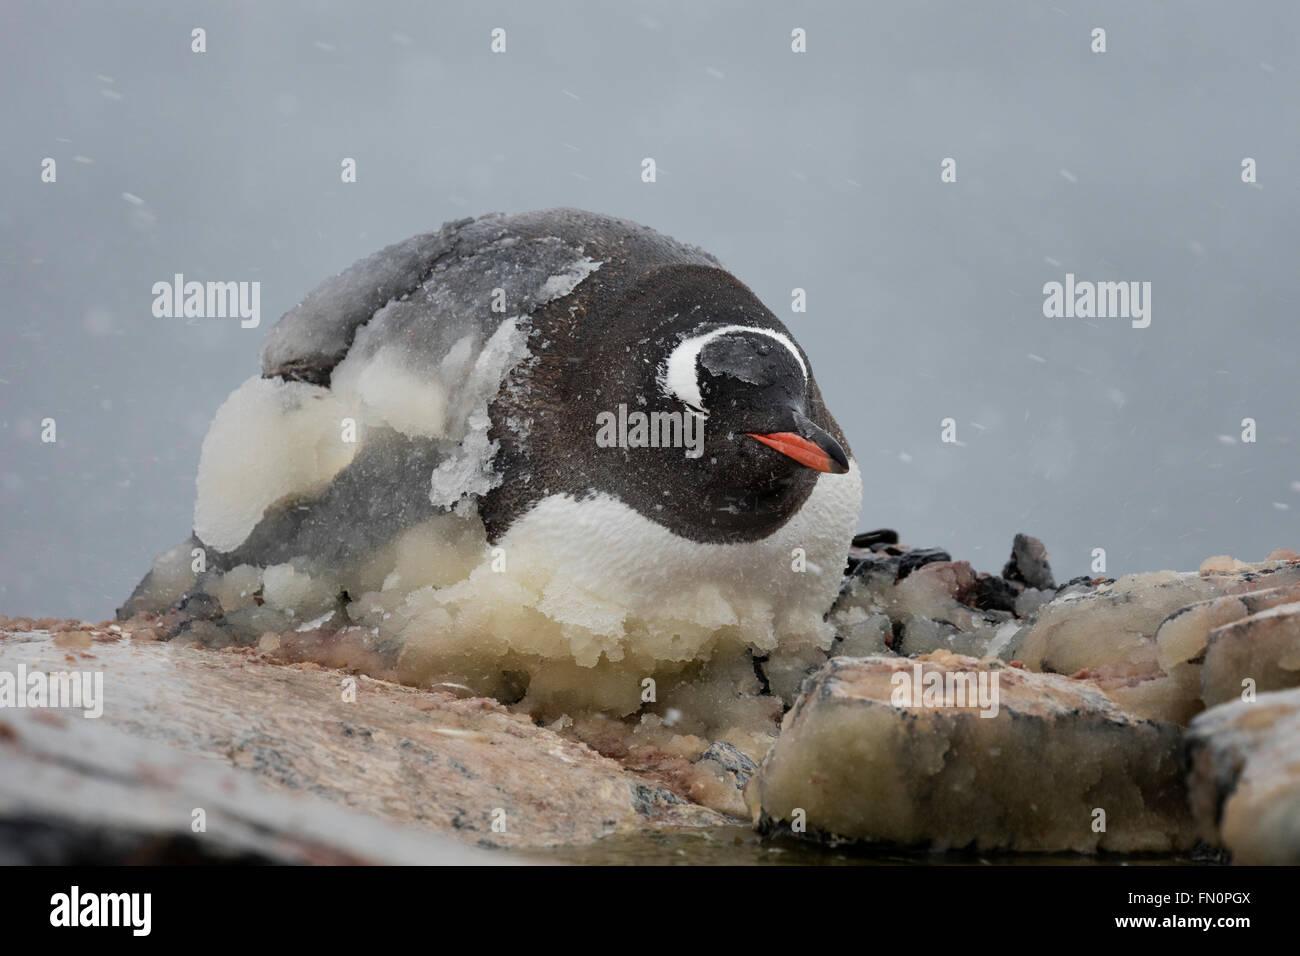 Antarctica, Antarctic peninsula, Booth Island, gentoo penguin lying on nest, covered in ice - Stock Image